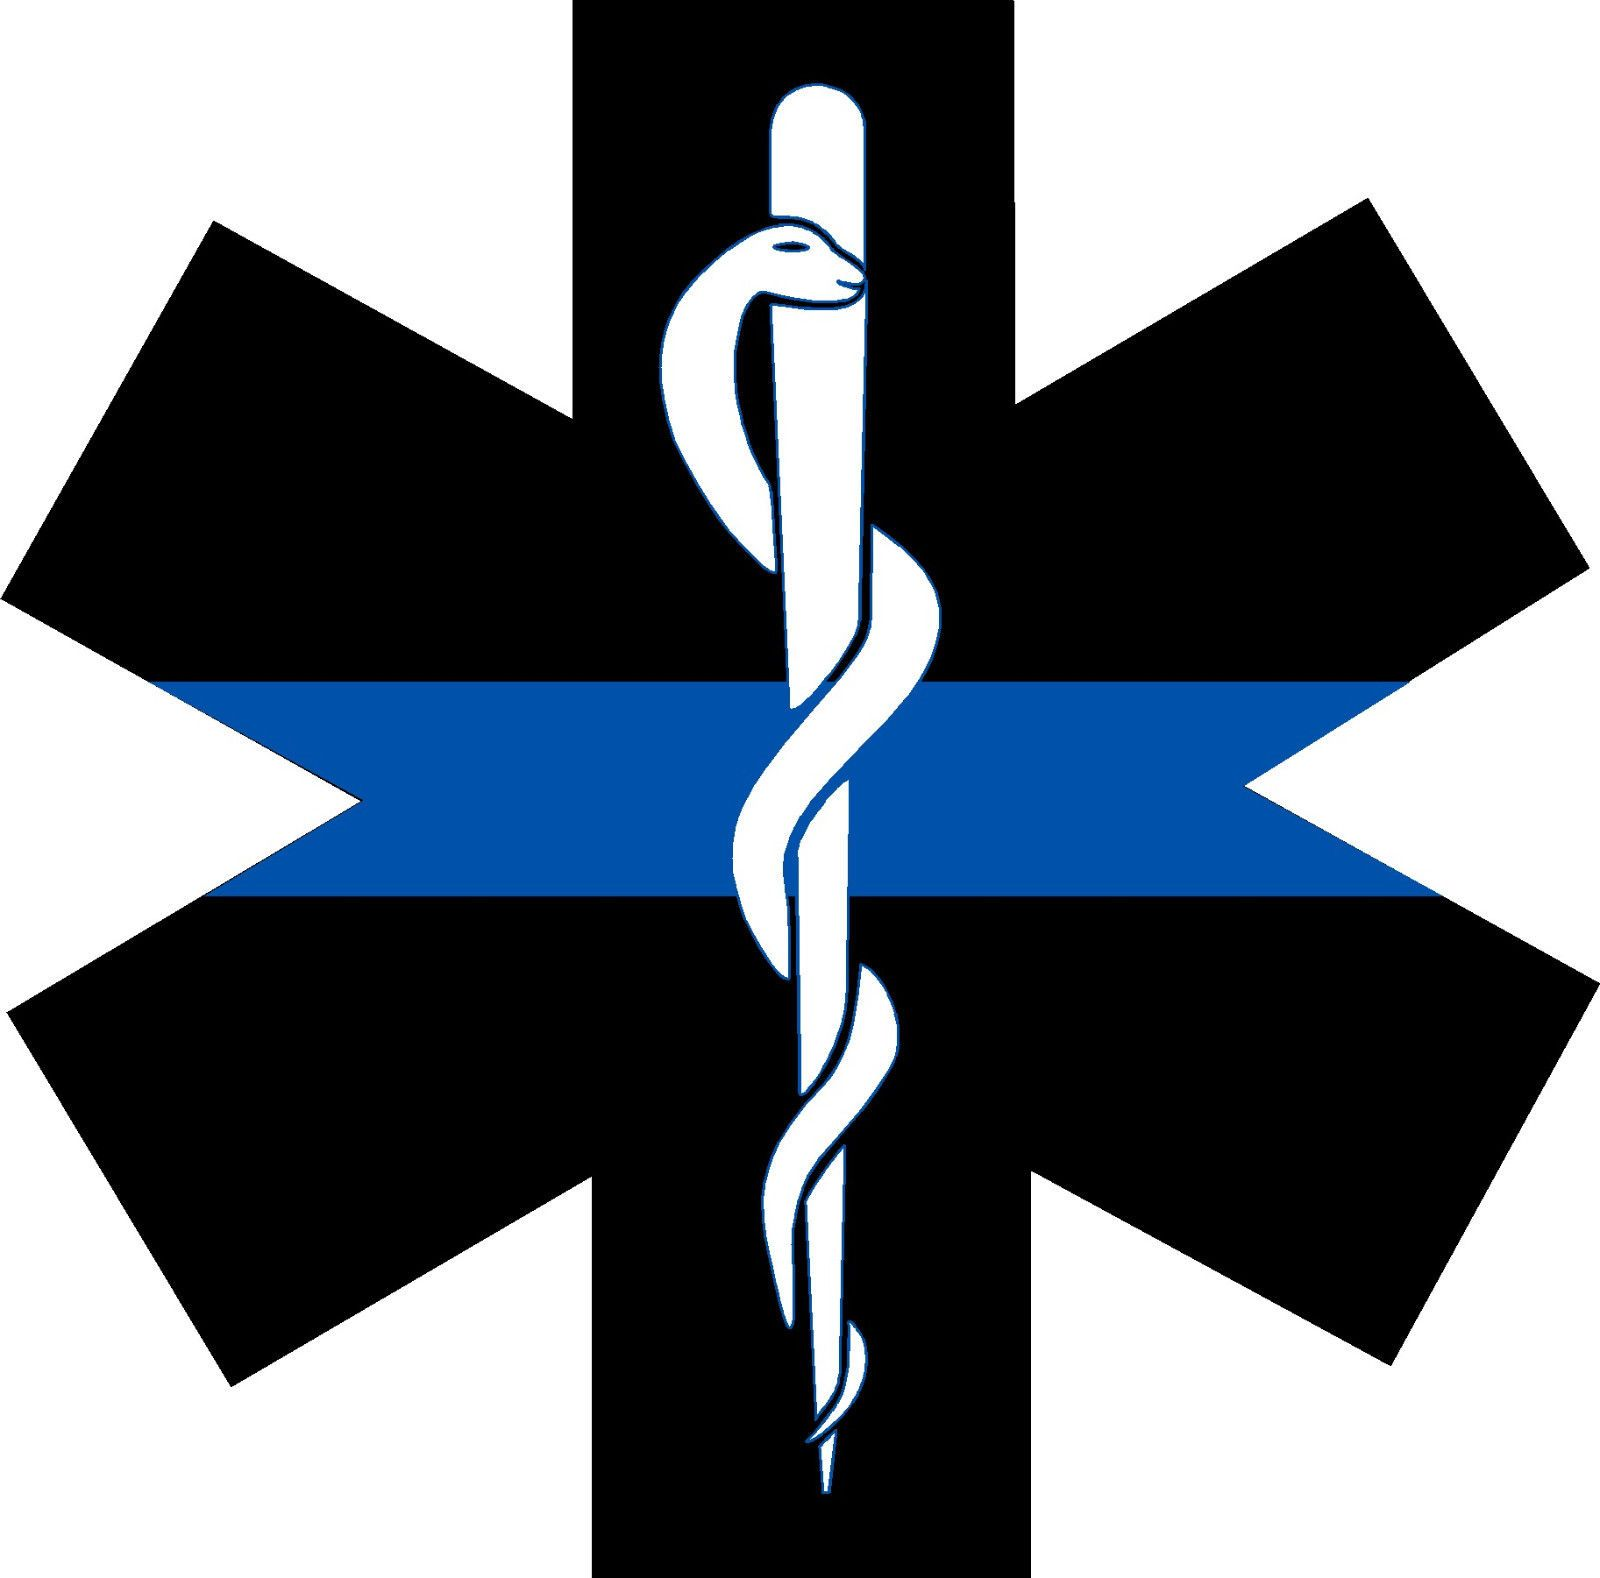 nursing symbols vinyl decal with star of life and nurse cap sticker rh pinterest com Professional Caduceus U.S. Army Medical Caduceus